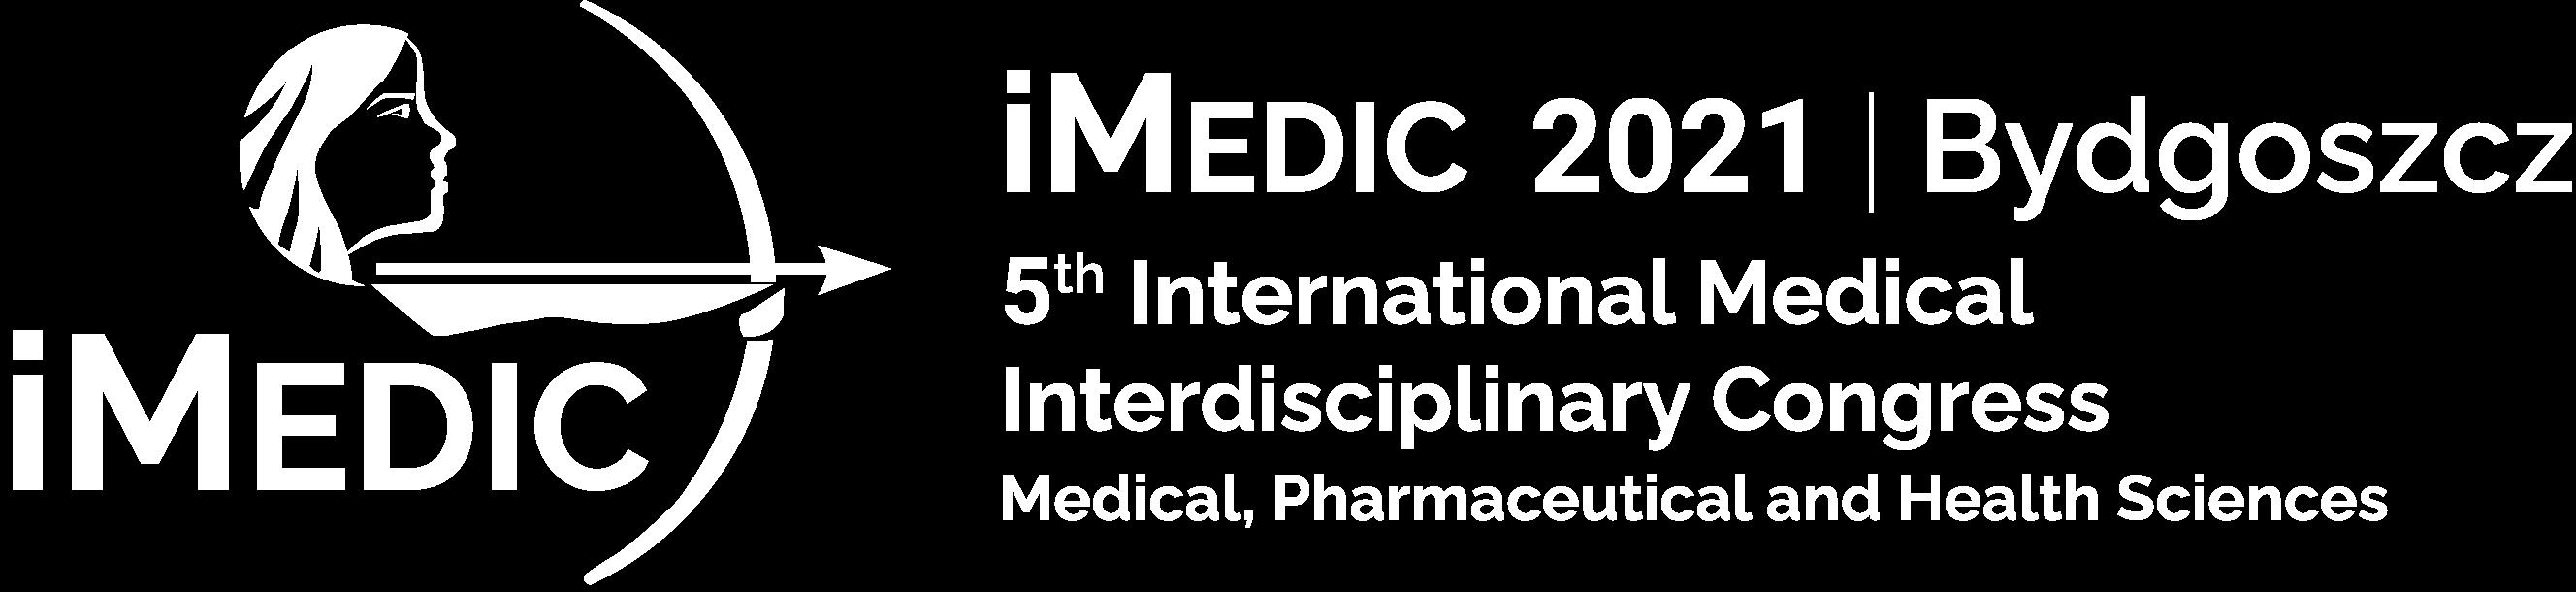 iMedic Congress 2021